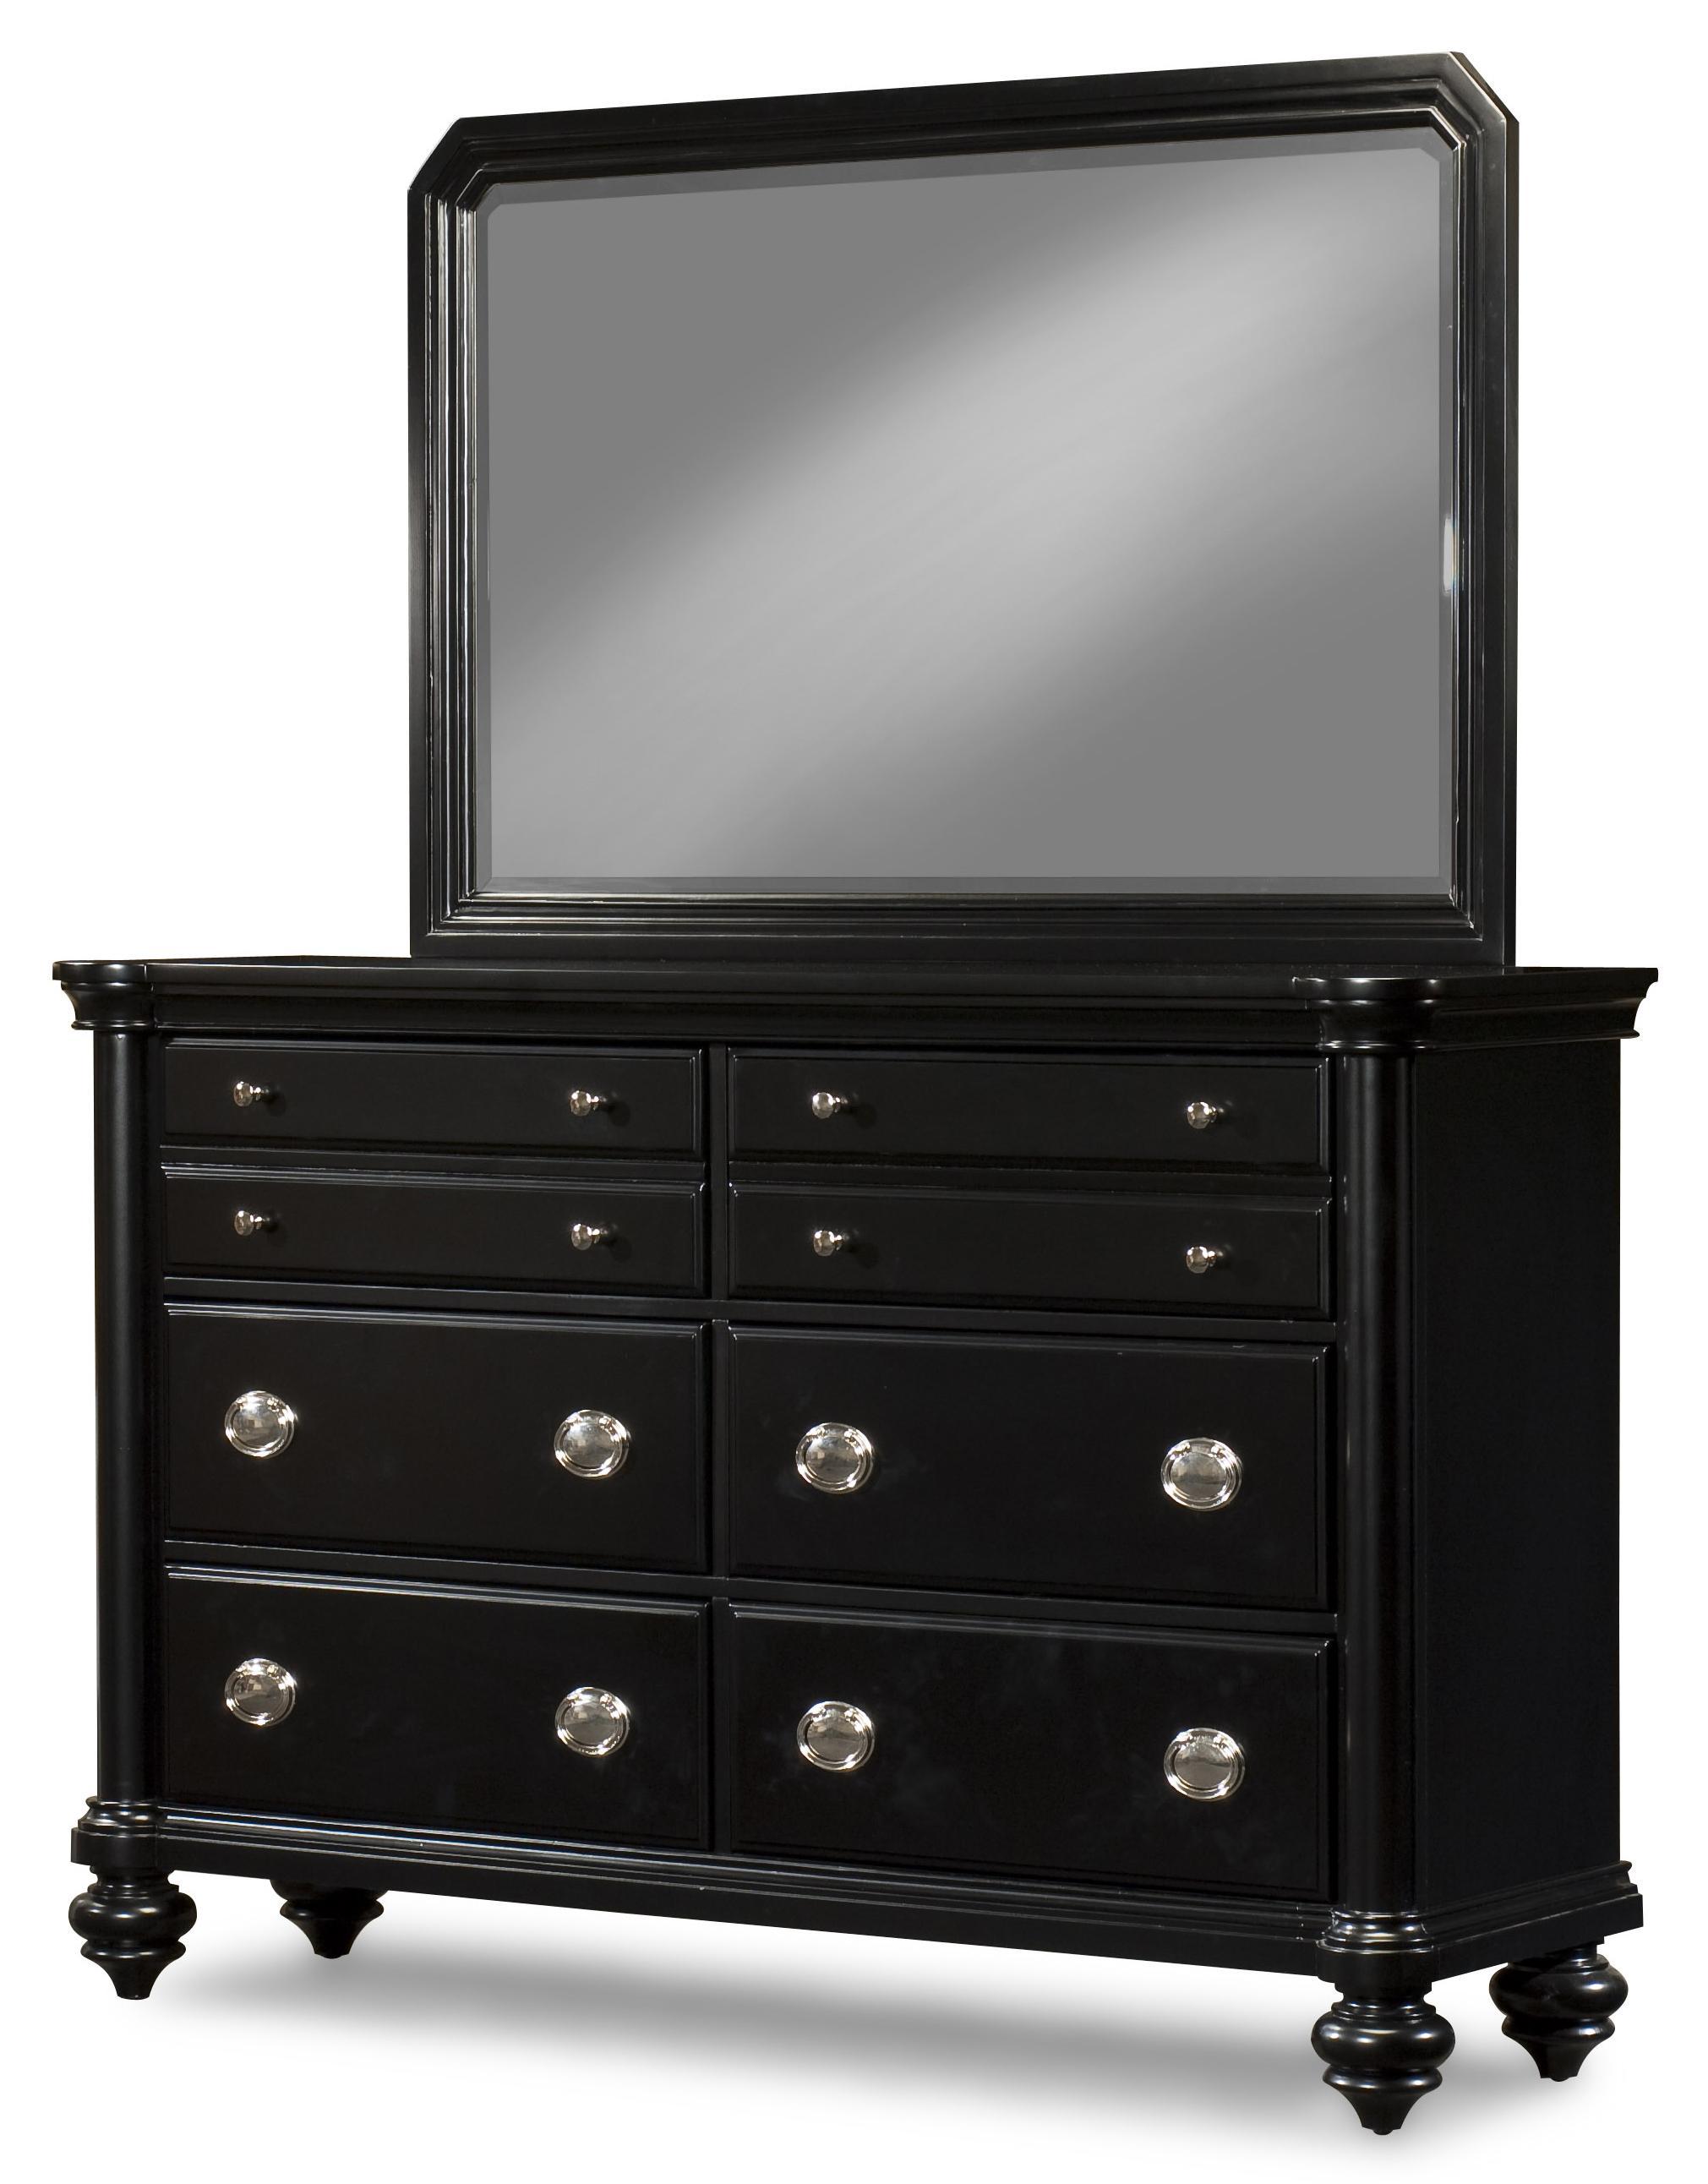 Morris Home Furnishings Darlington Dresser and Mirror - Item Number: 652-650+660